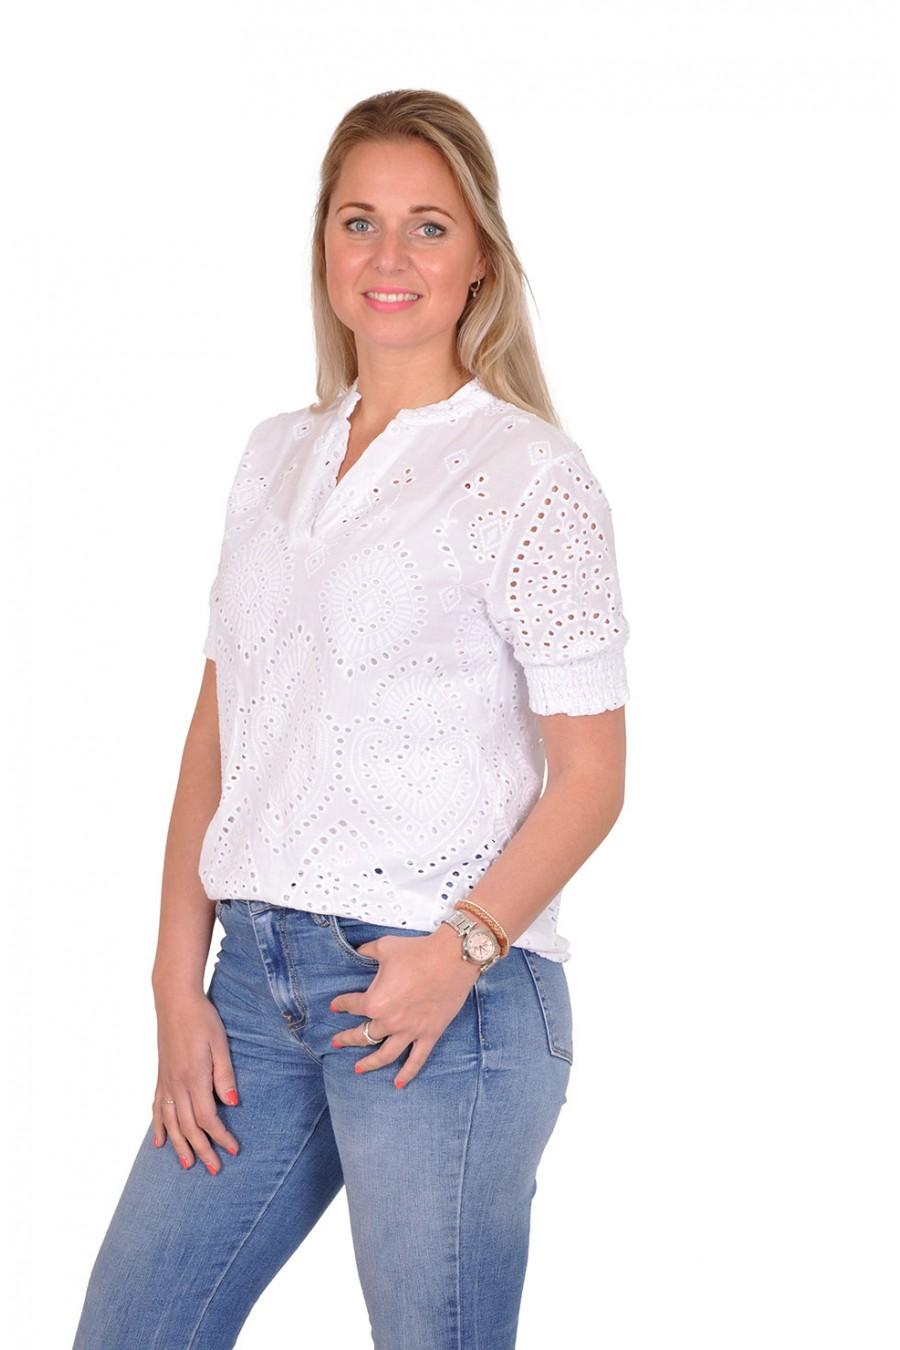 Broderie blouse met V-hals en korte mouwen wit Savinni